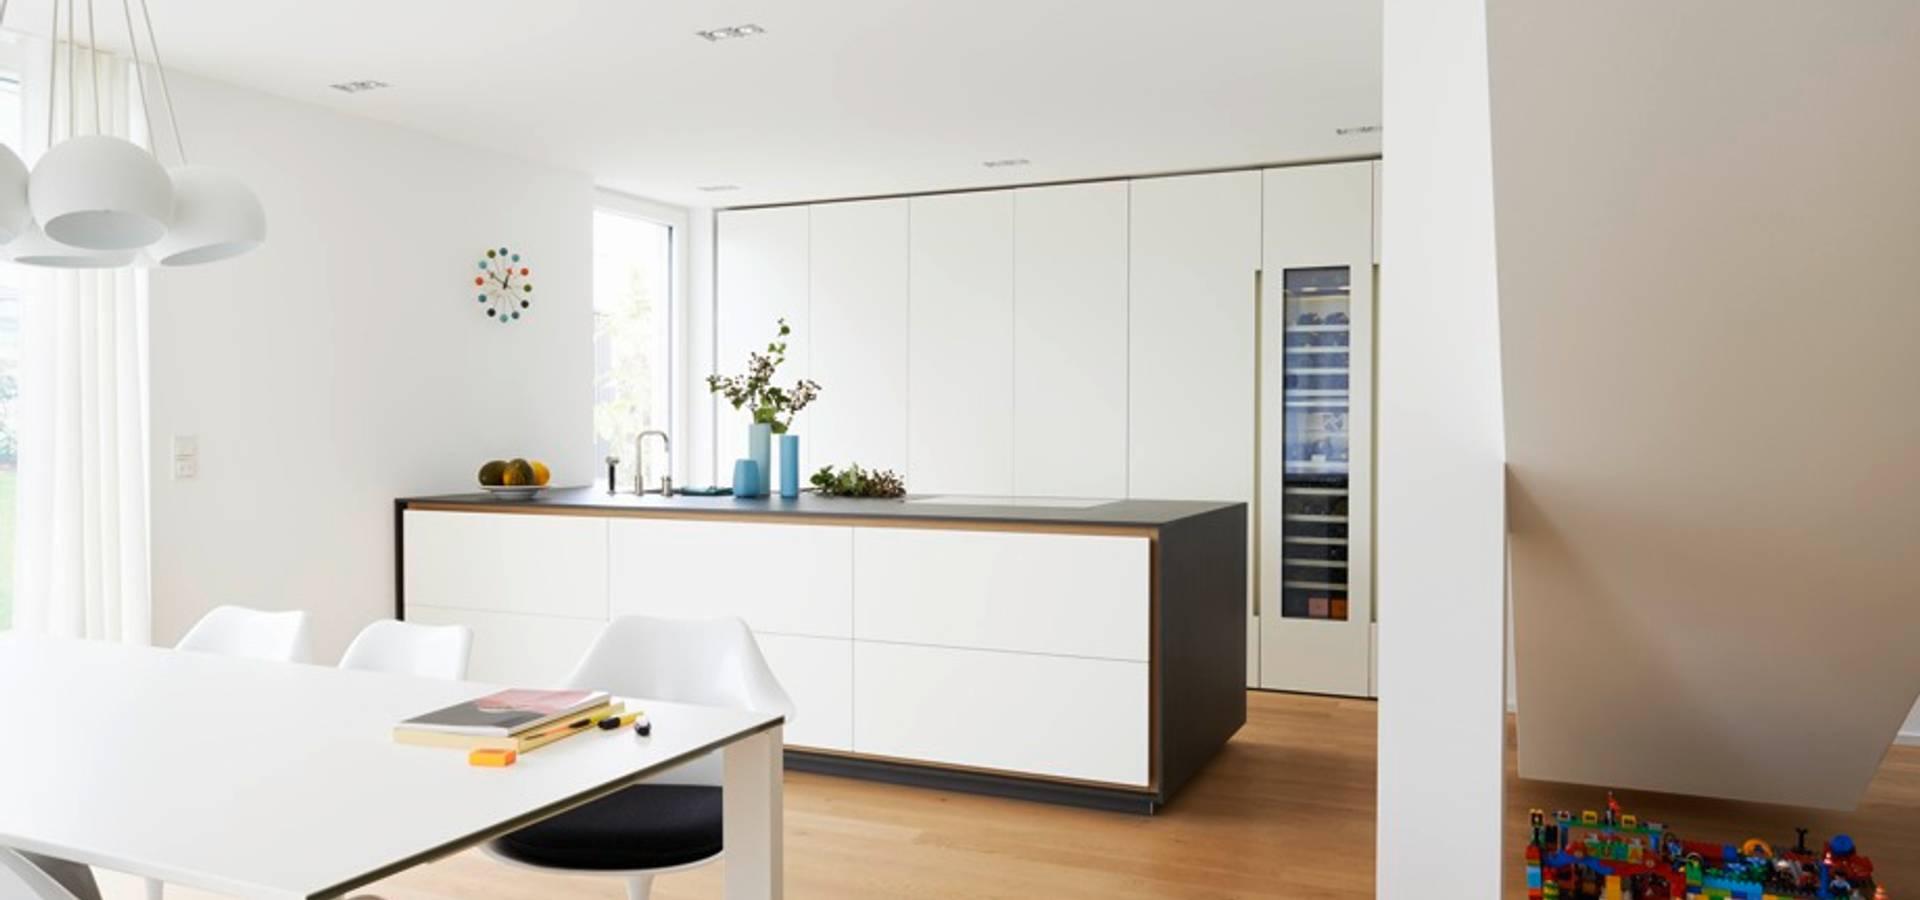 wellness im keller von la cucina k chenspezialist gmbh co kg homify. Black Bedroom Furniture Sets. Home Design Ideas